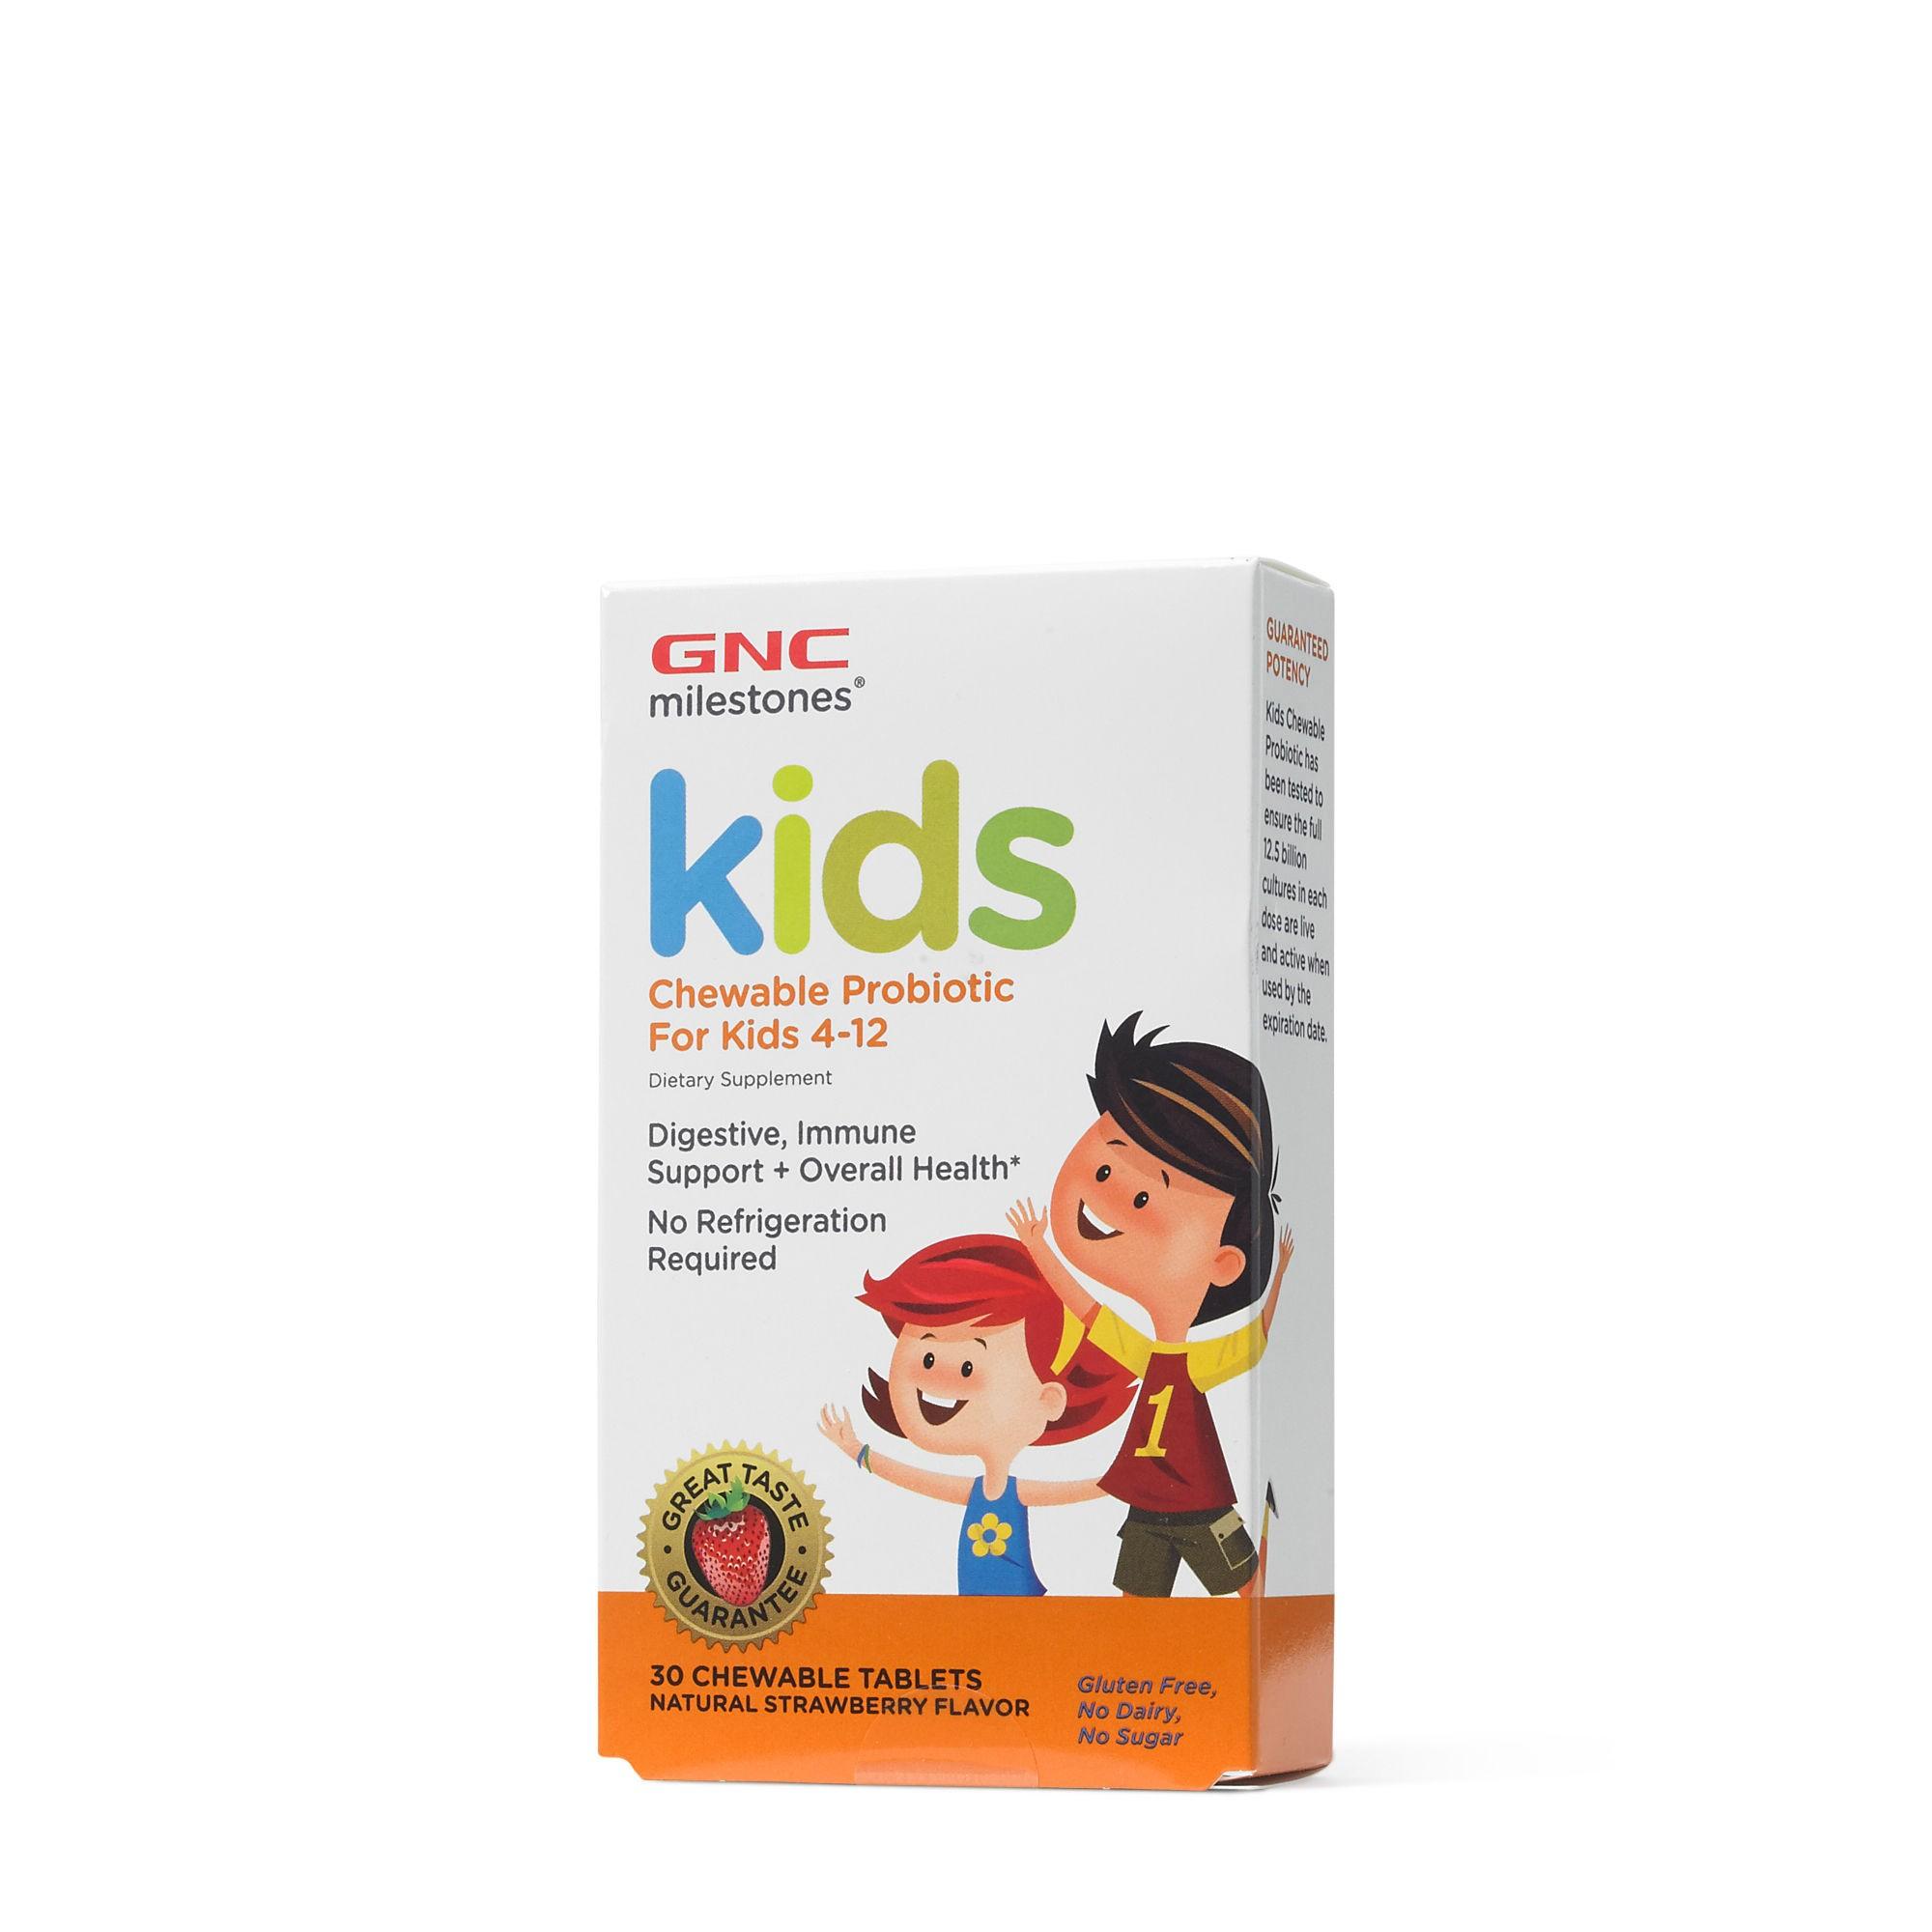 GNC Milestones® Kids Chewable Probiotic, Probiotice Masticabile Pentru Copii 4-12 ani, cu Aroma Naturala de Capsuni, 30 tb